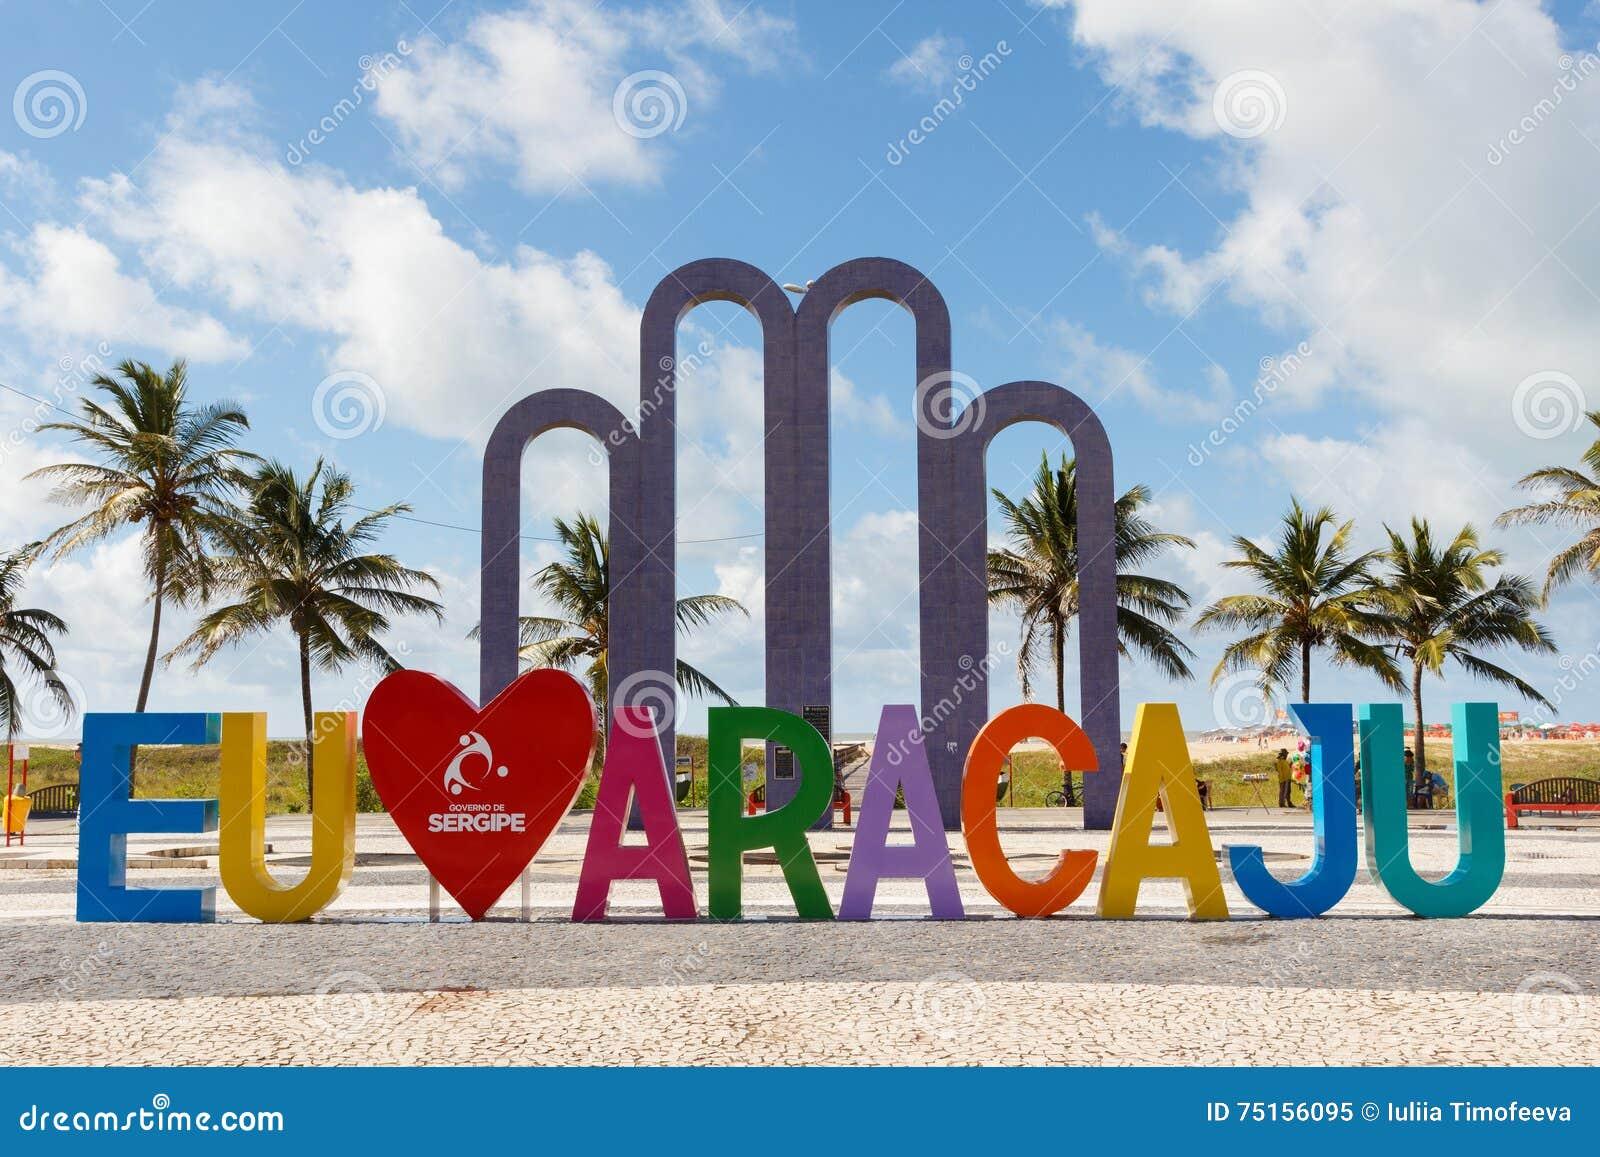 J aime Aracaju sur la plage célèbre Atalaia dans Aracaju, Sergipe, Brésil